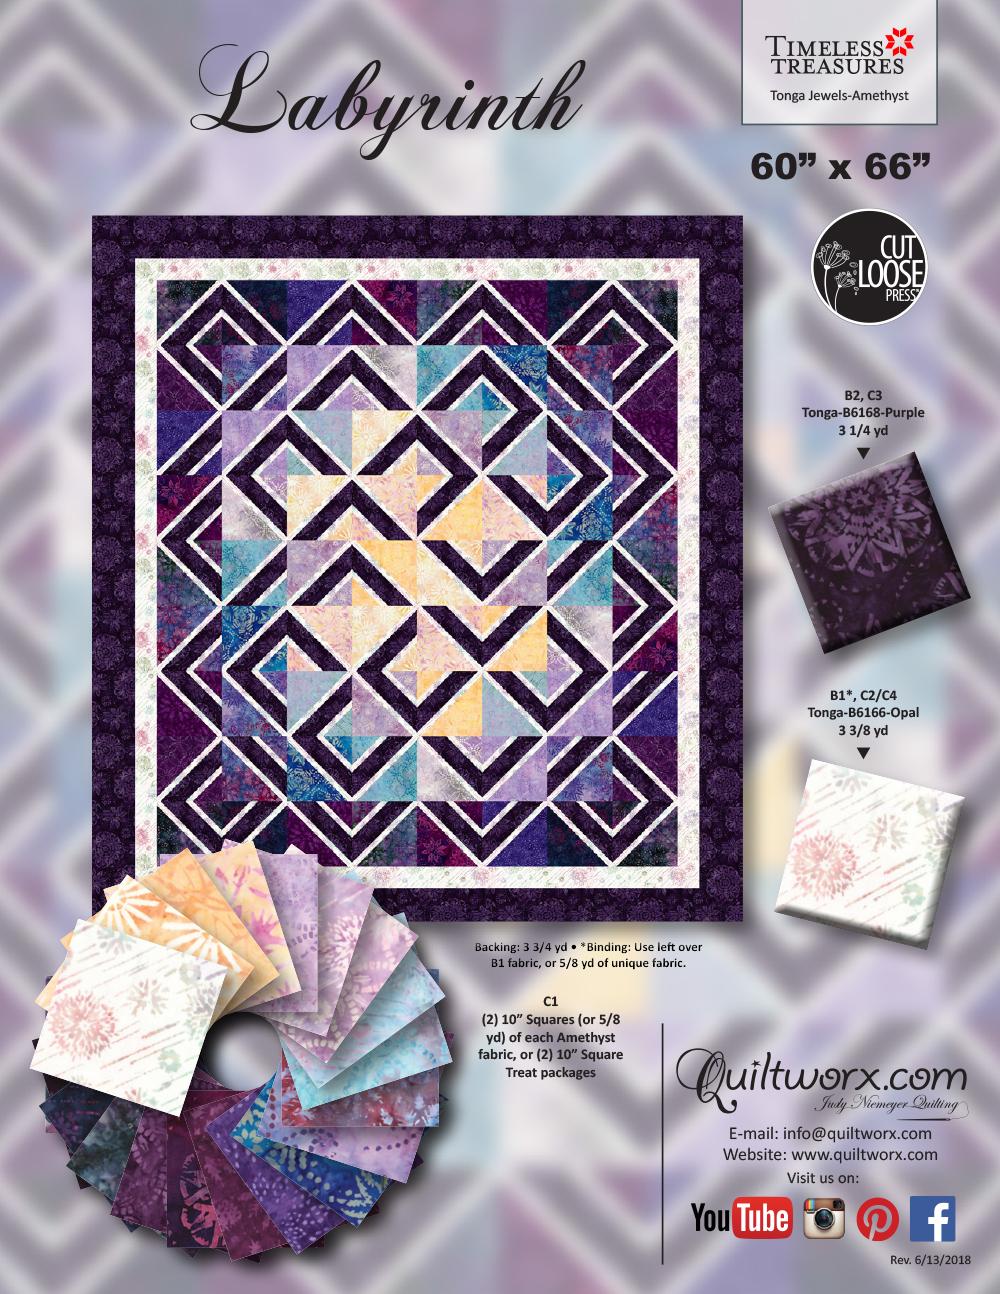 Labyrinth-Amethyst-1pg-KS